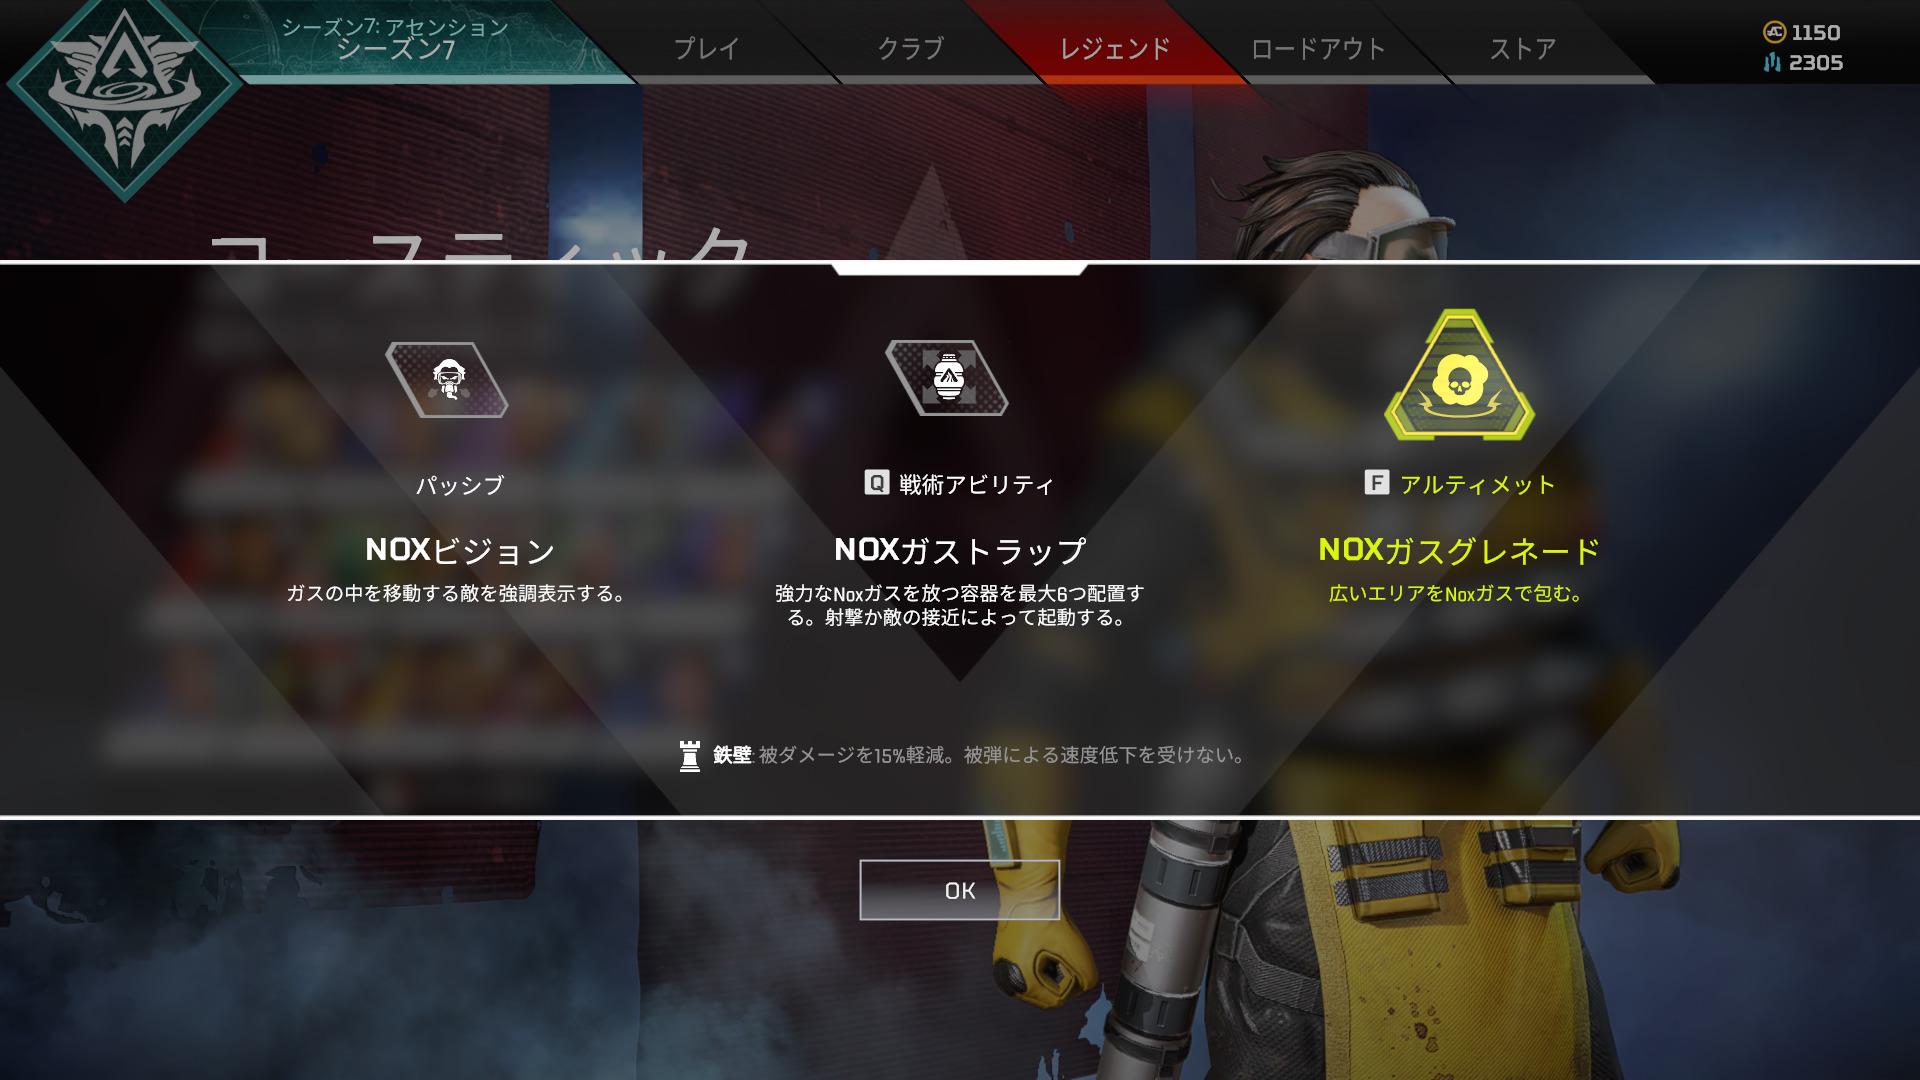 【Apex Legends】コースティック 日本語セリフ一覧【基本ボイス】【エーペックスレジェンズ】